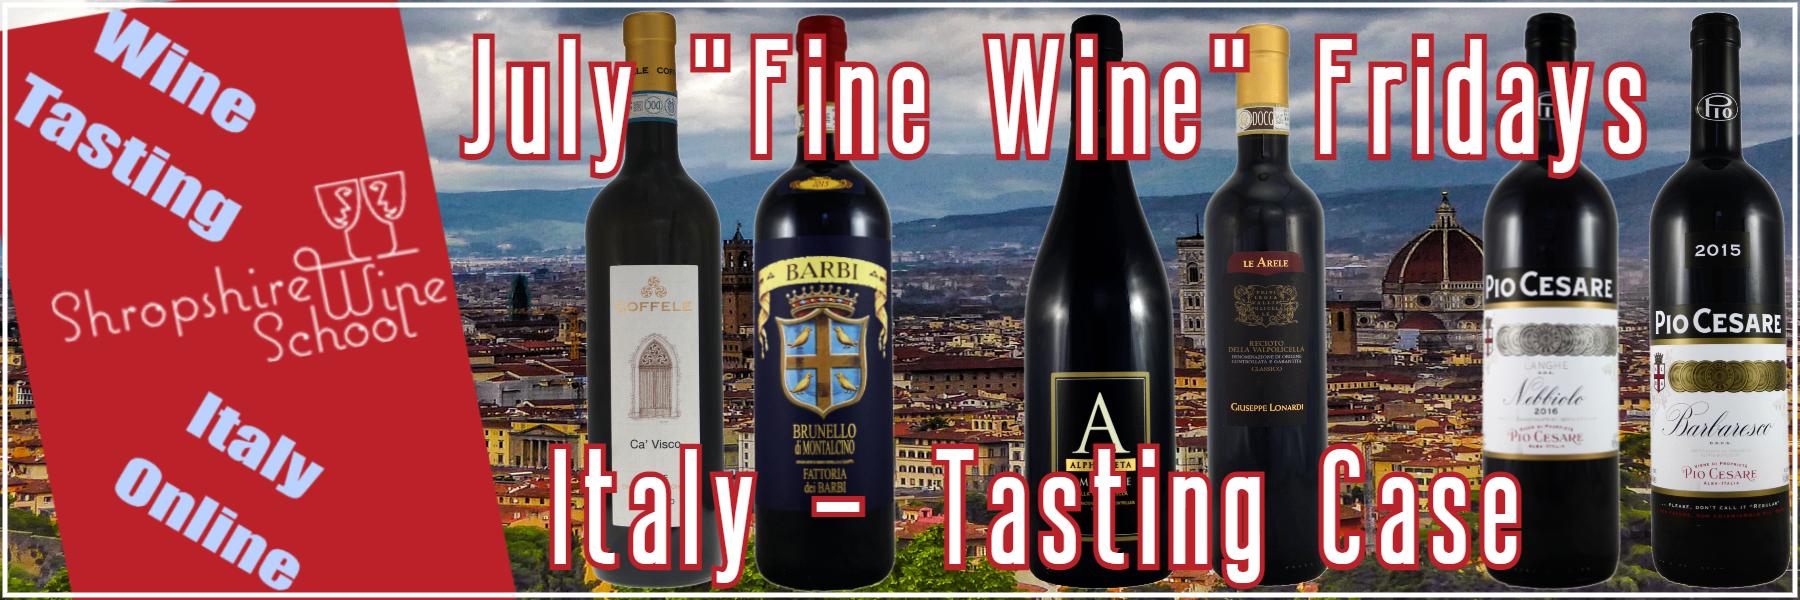 Italy - Shropshire wine School